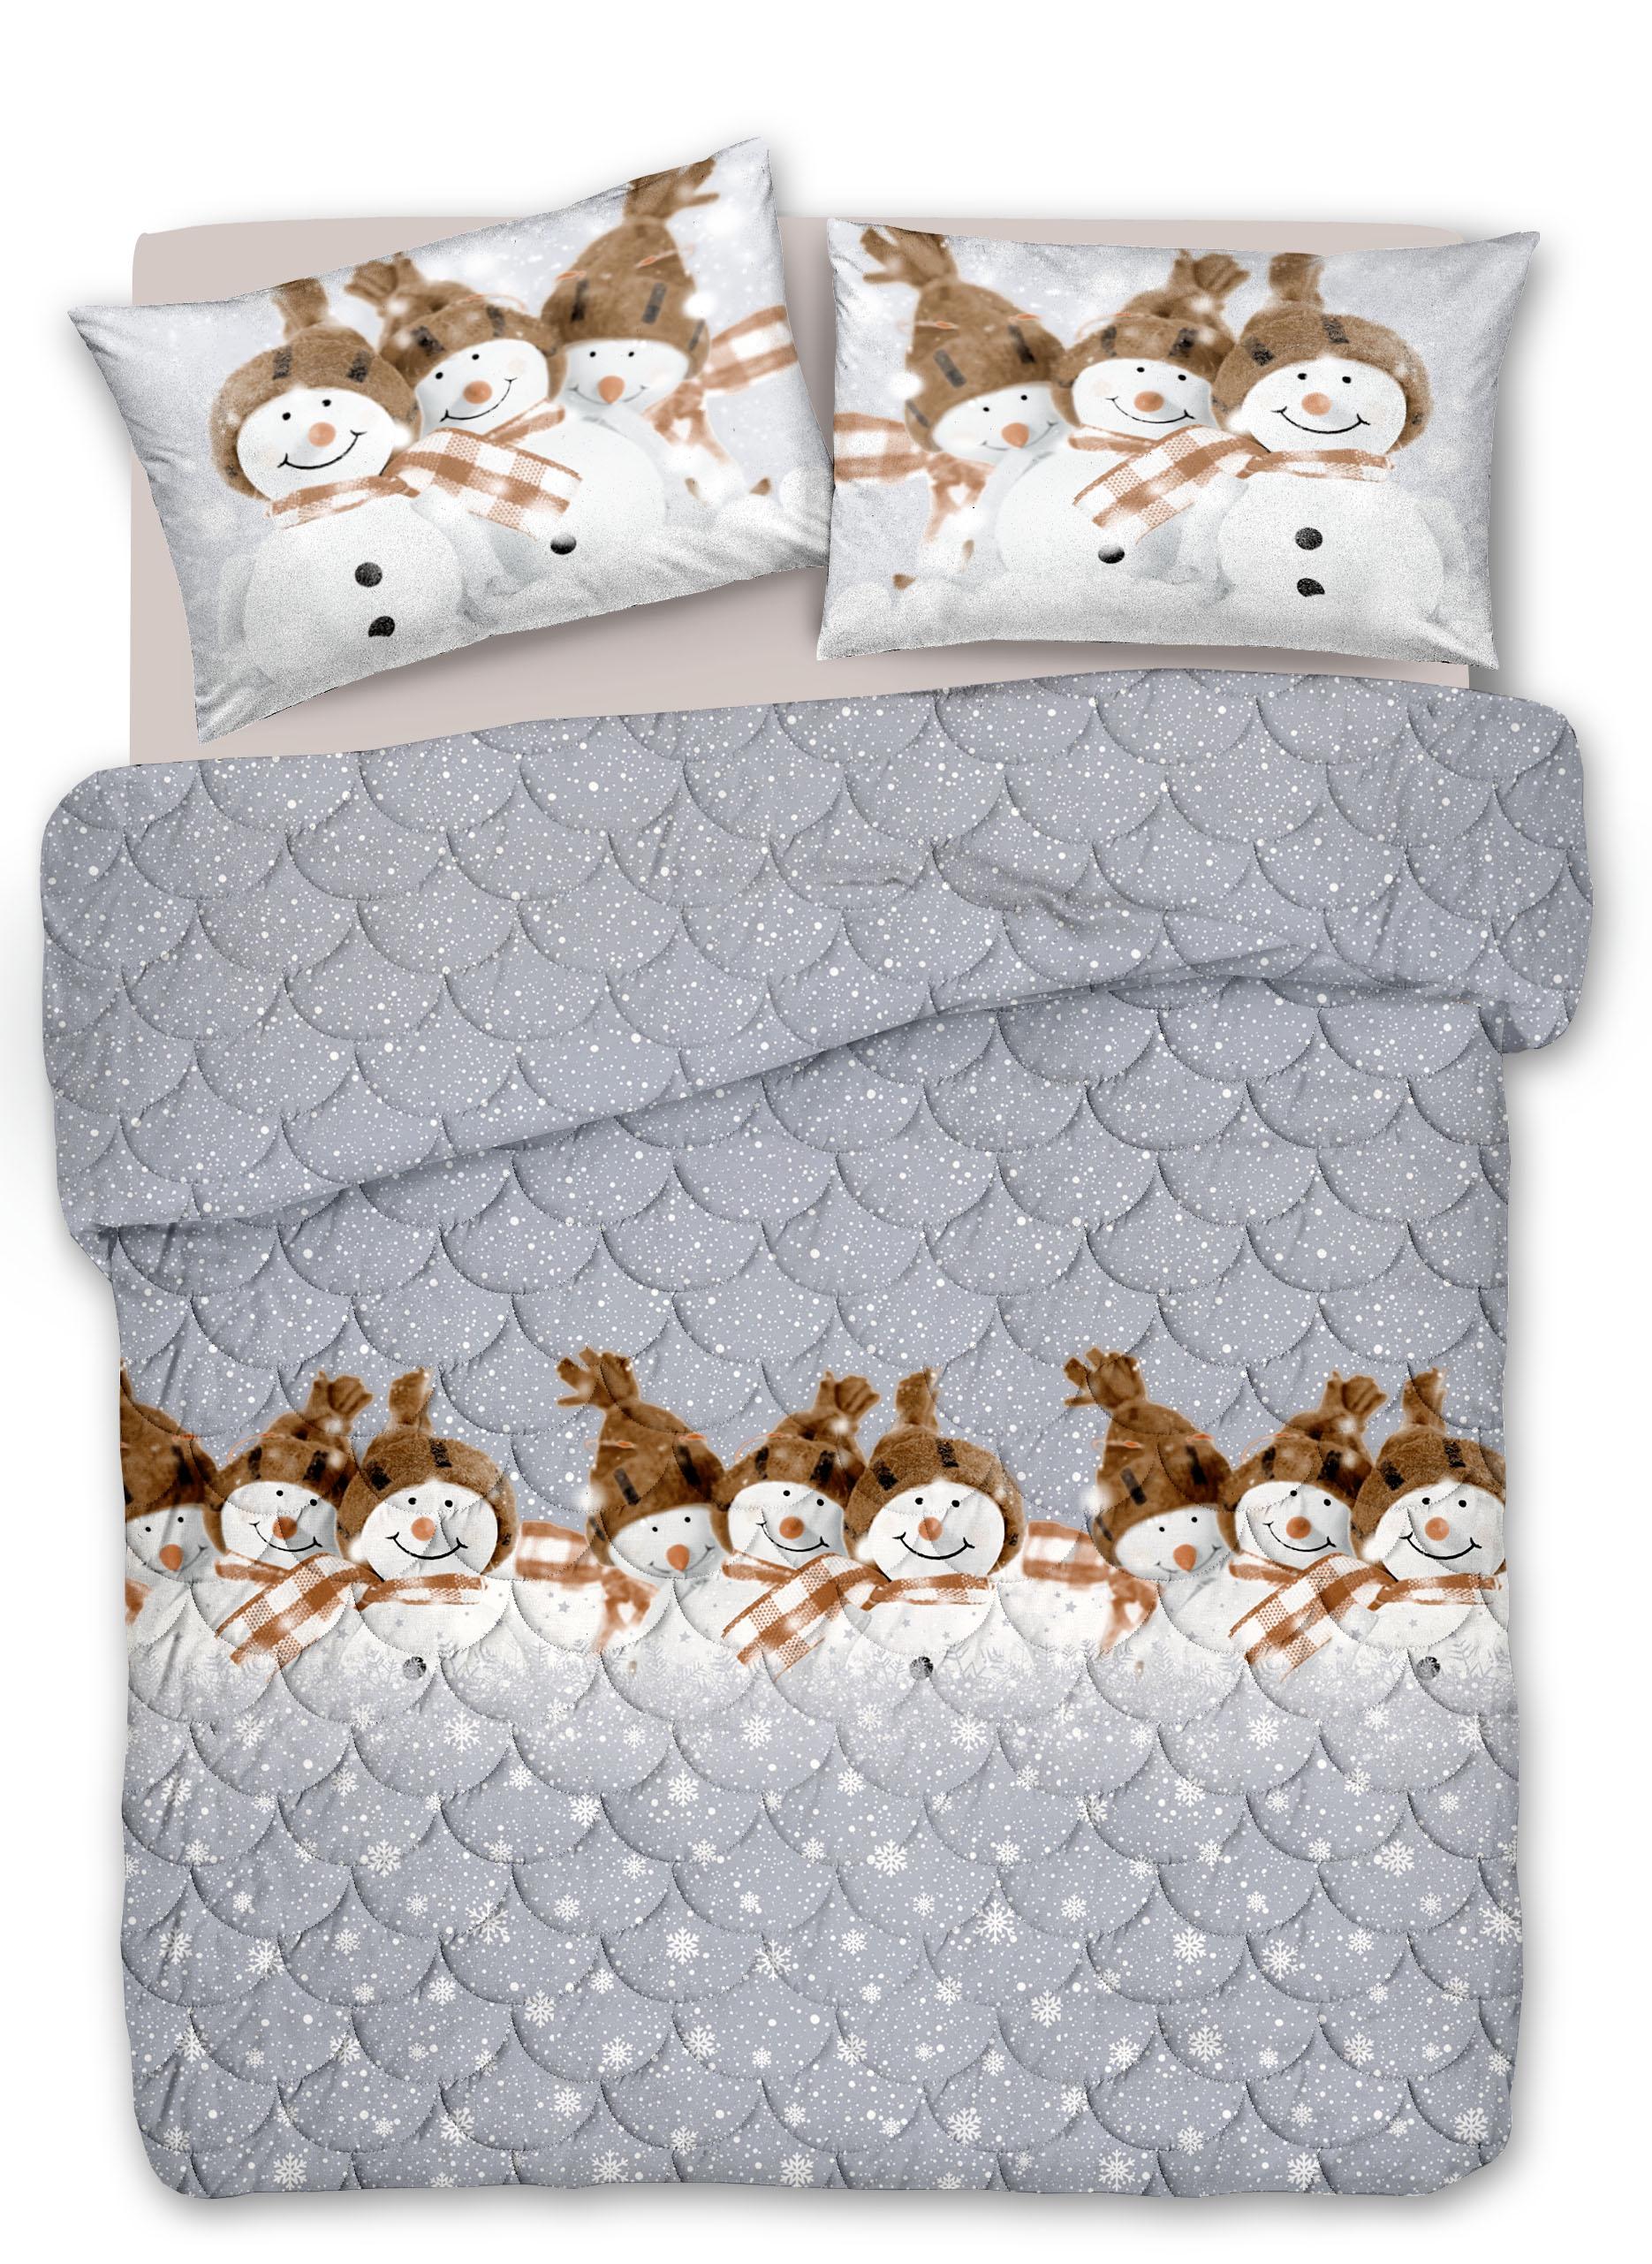 Trapunta Invernale Cotone Snowman